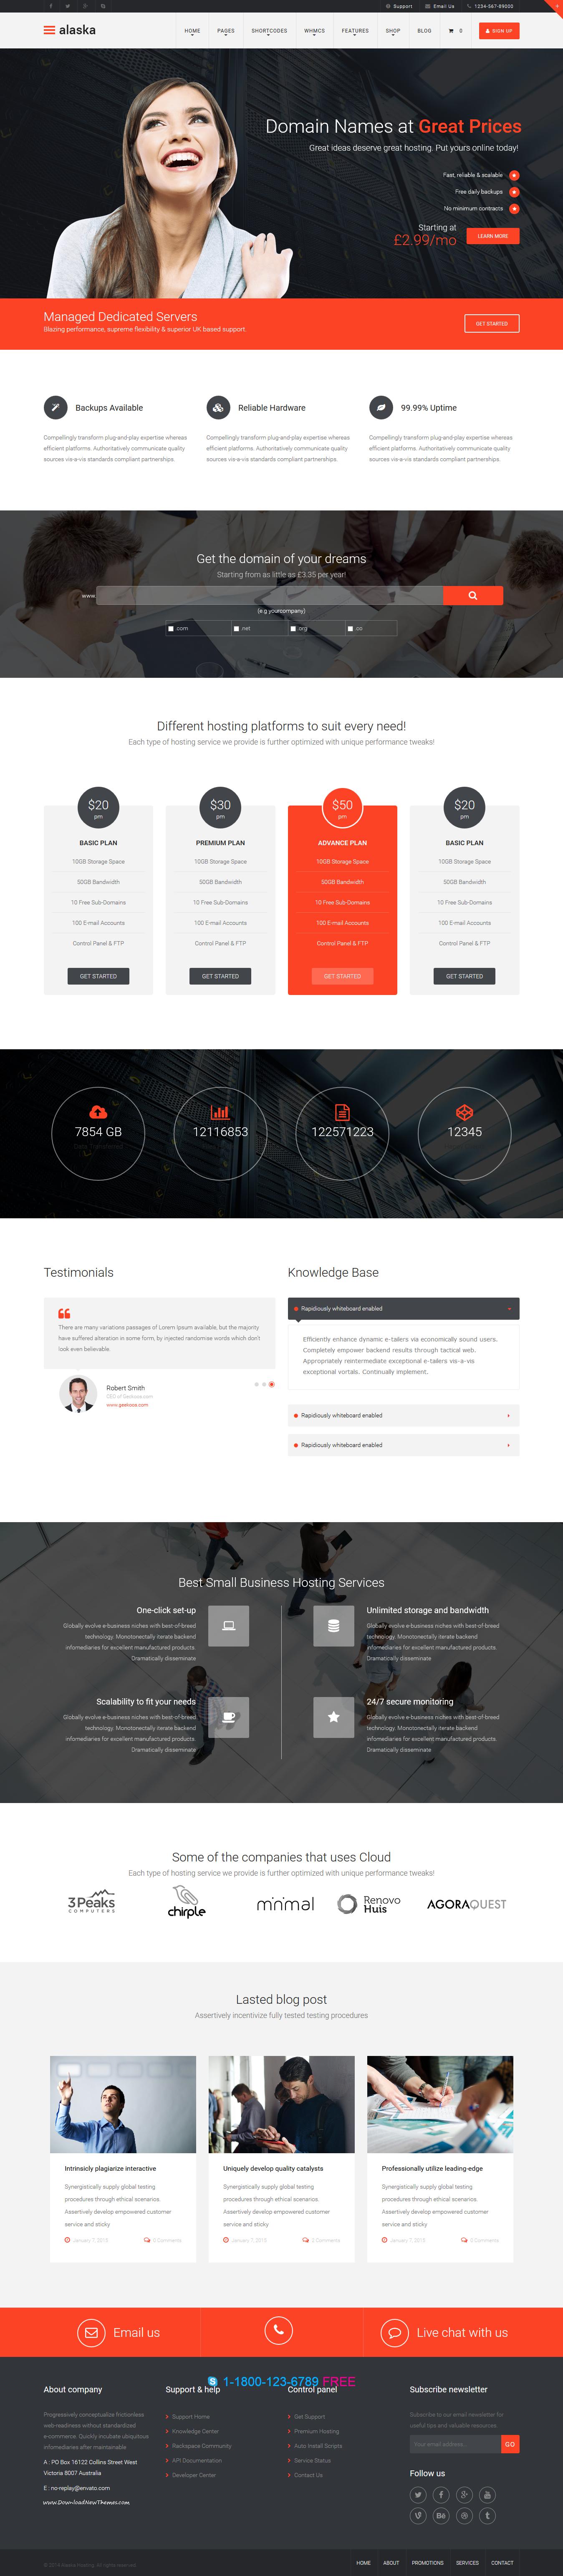 Alaska - Responsive HTML/CSS Hosting Template | Alaska, Website and ...